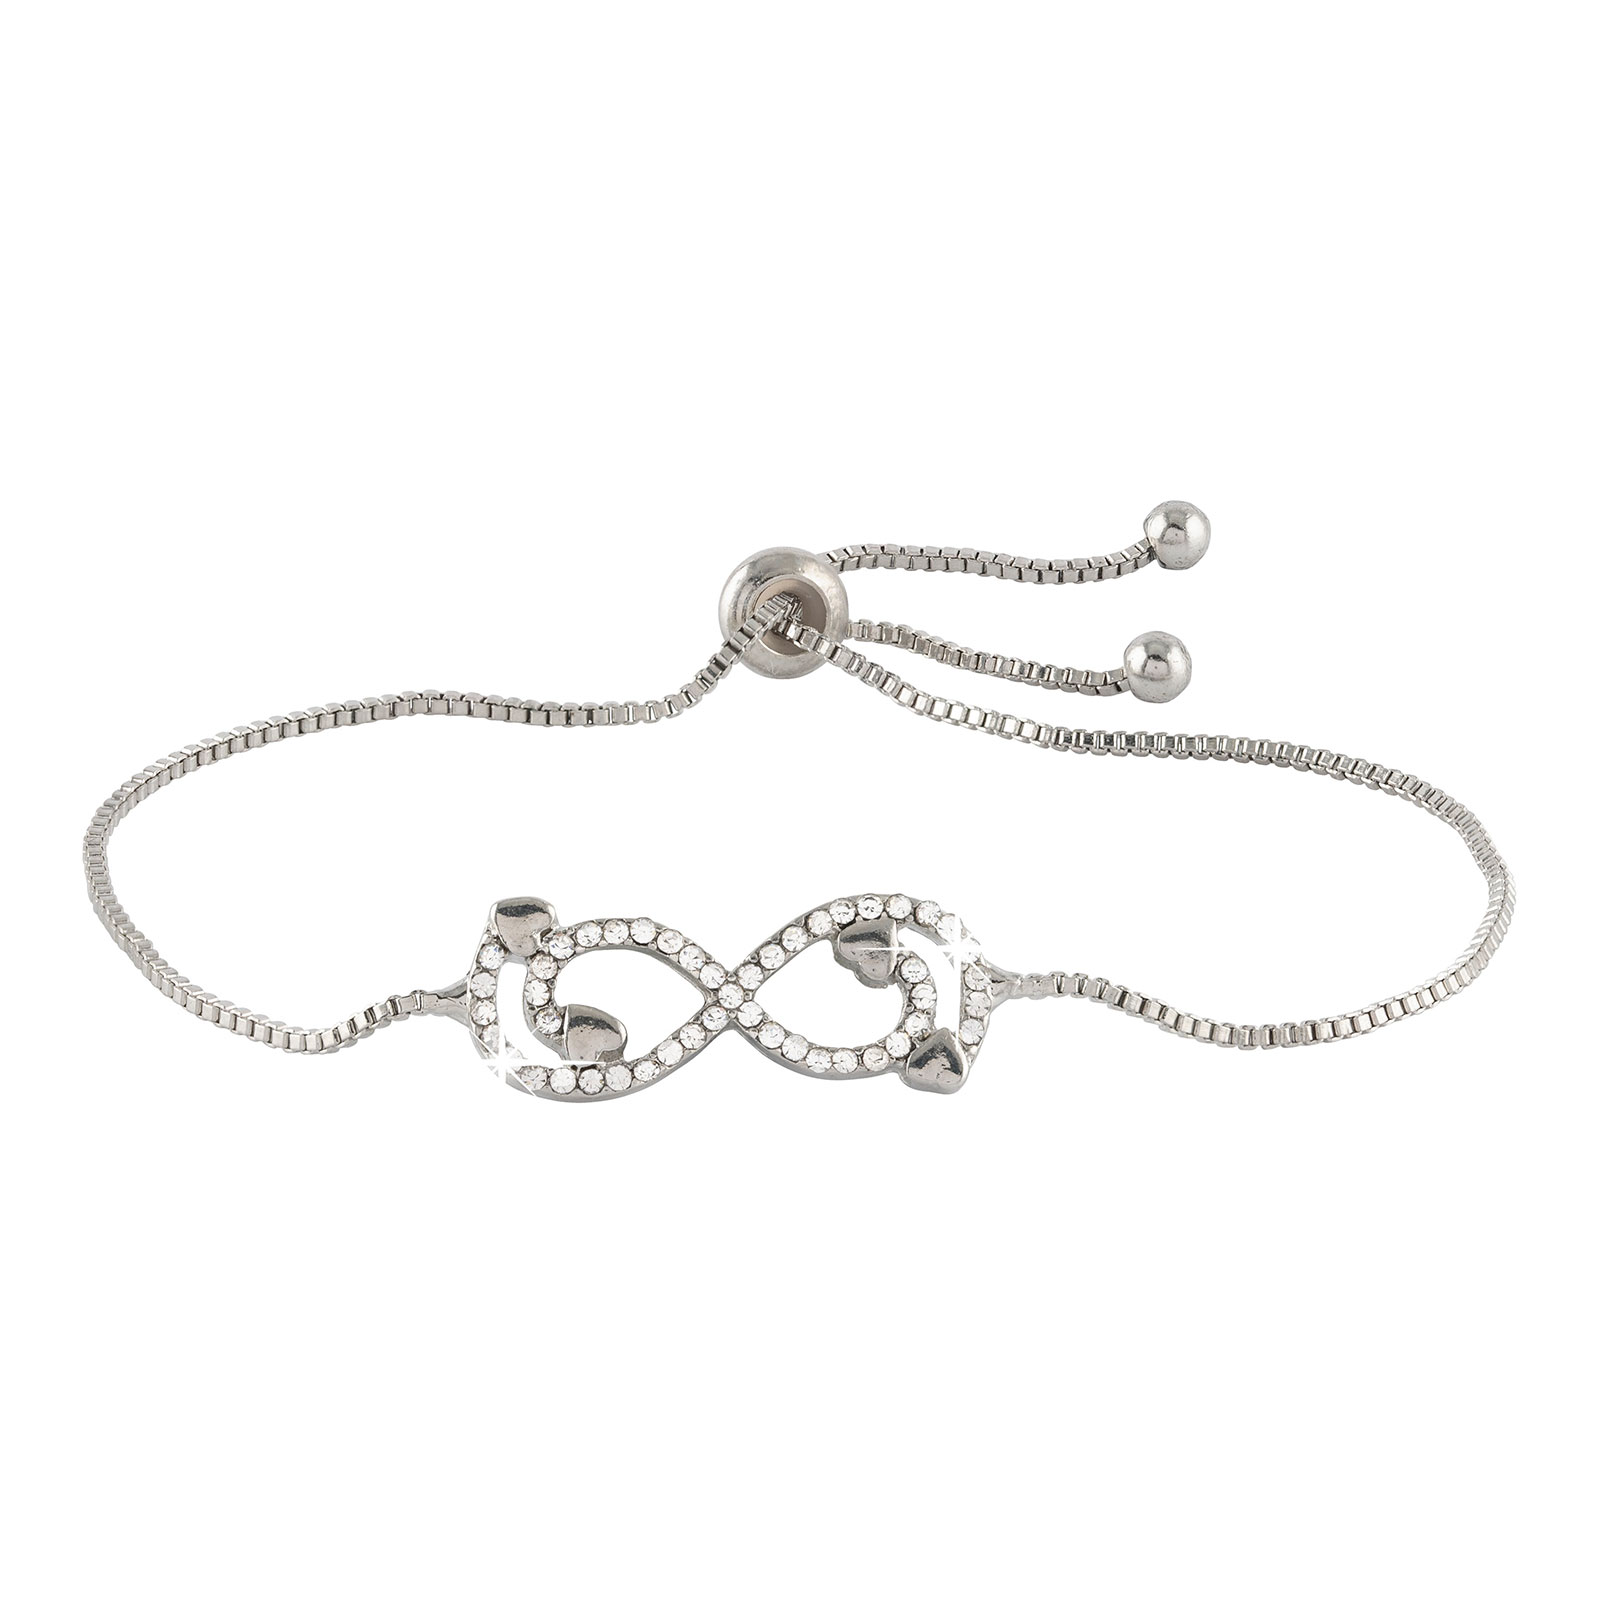 Armband - Silverfärgat med infinitysymbol